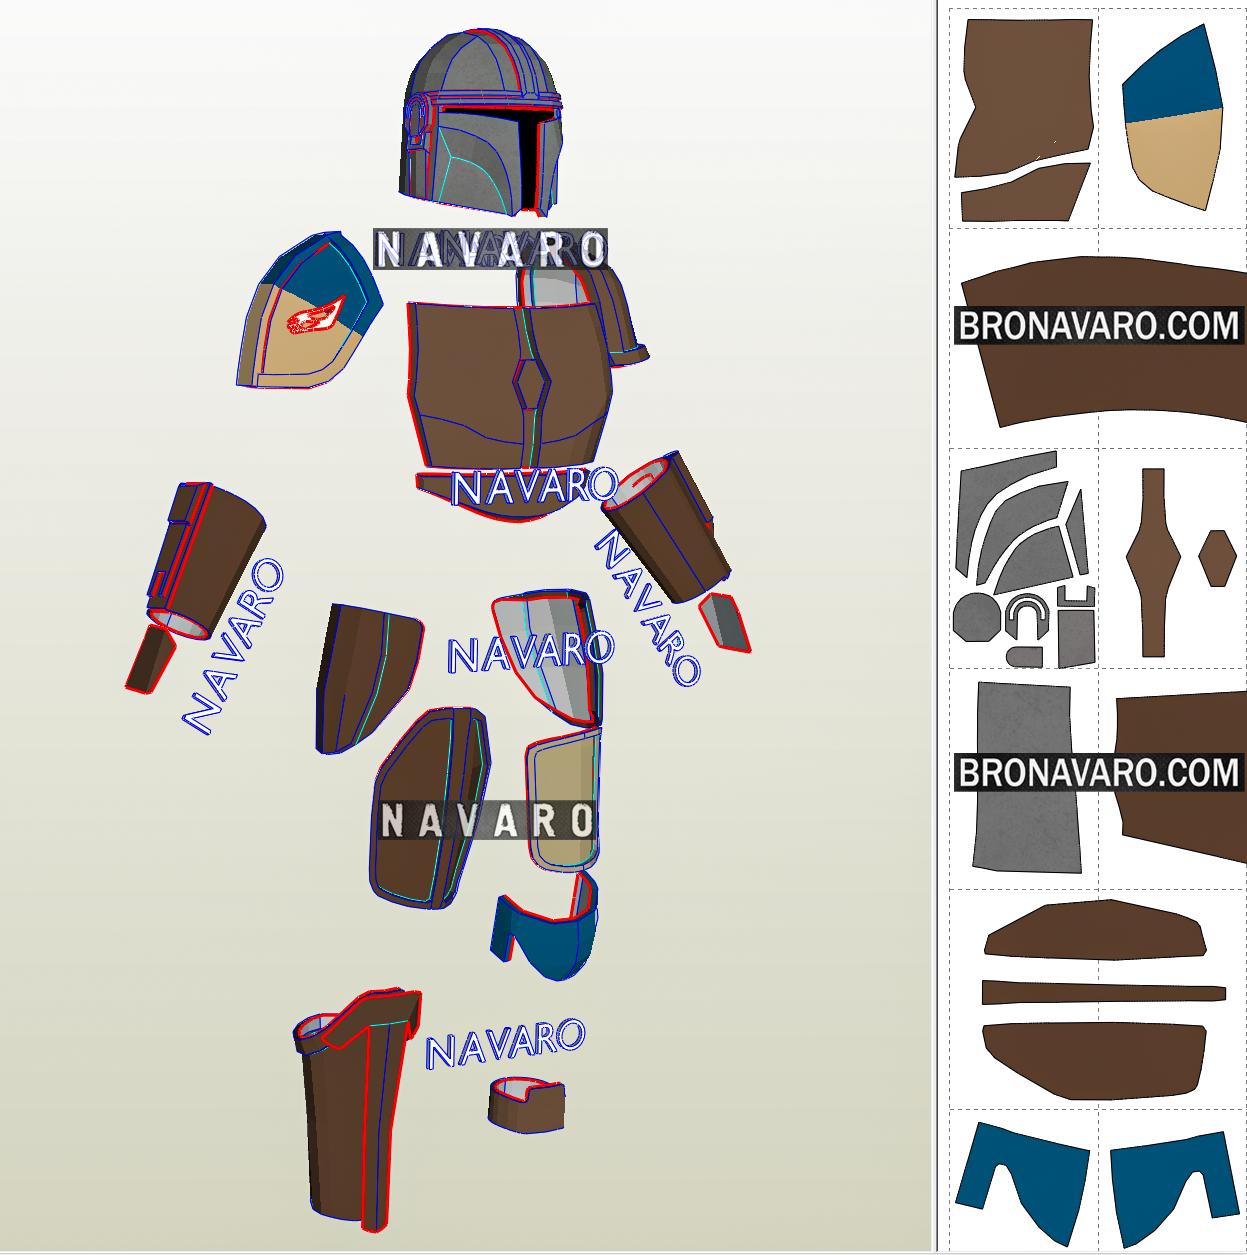 guia. Mandalorian cape starwars cosplay pattern PDF guide  Capa Mandaloriano Star Wars patr\u00f3n PDF